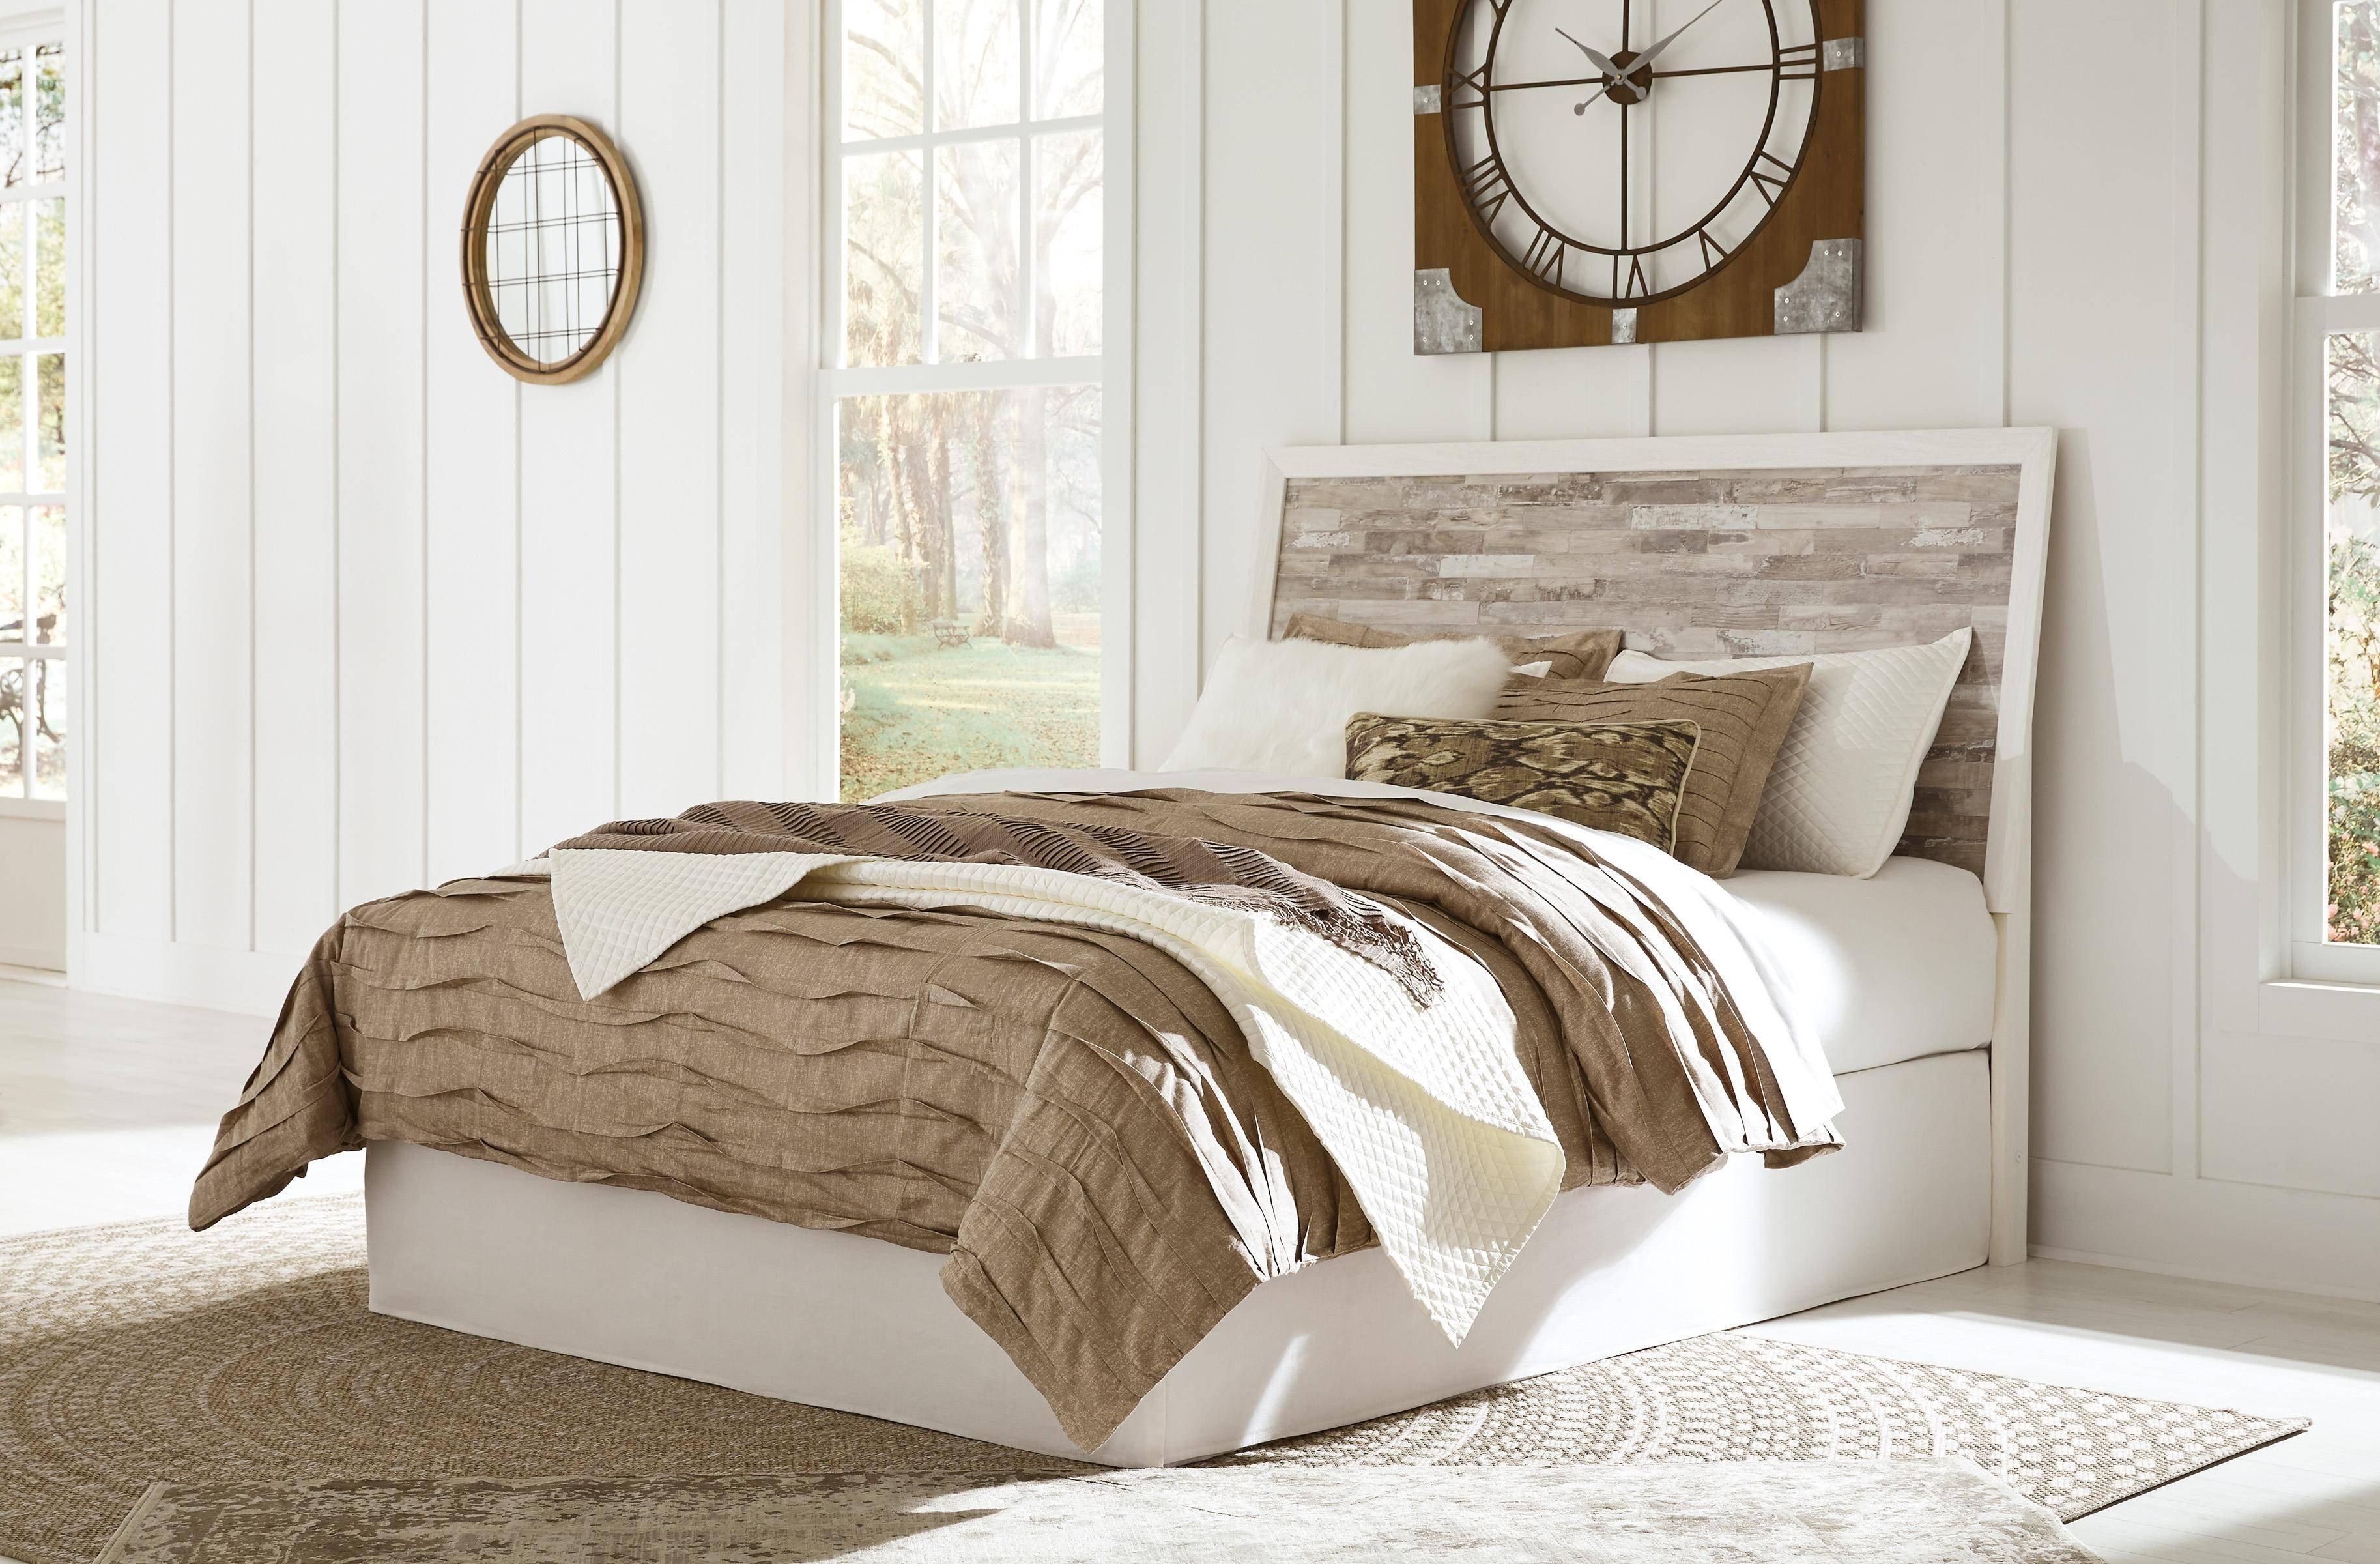 Cheap Bedroom Furniture Set Lovely ashley Evanni B315 Queen Size Platform Bedroom Set 6pcs In